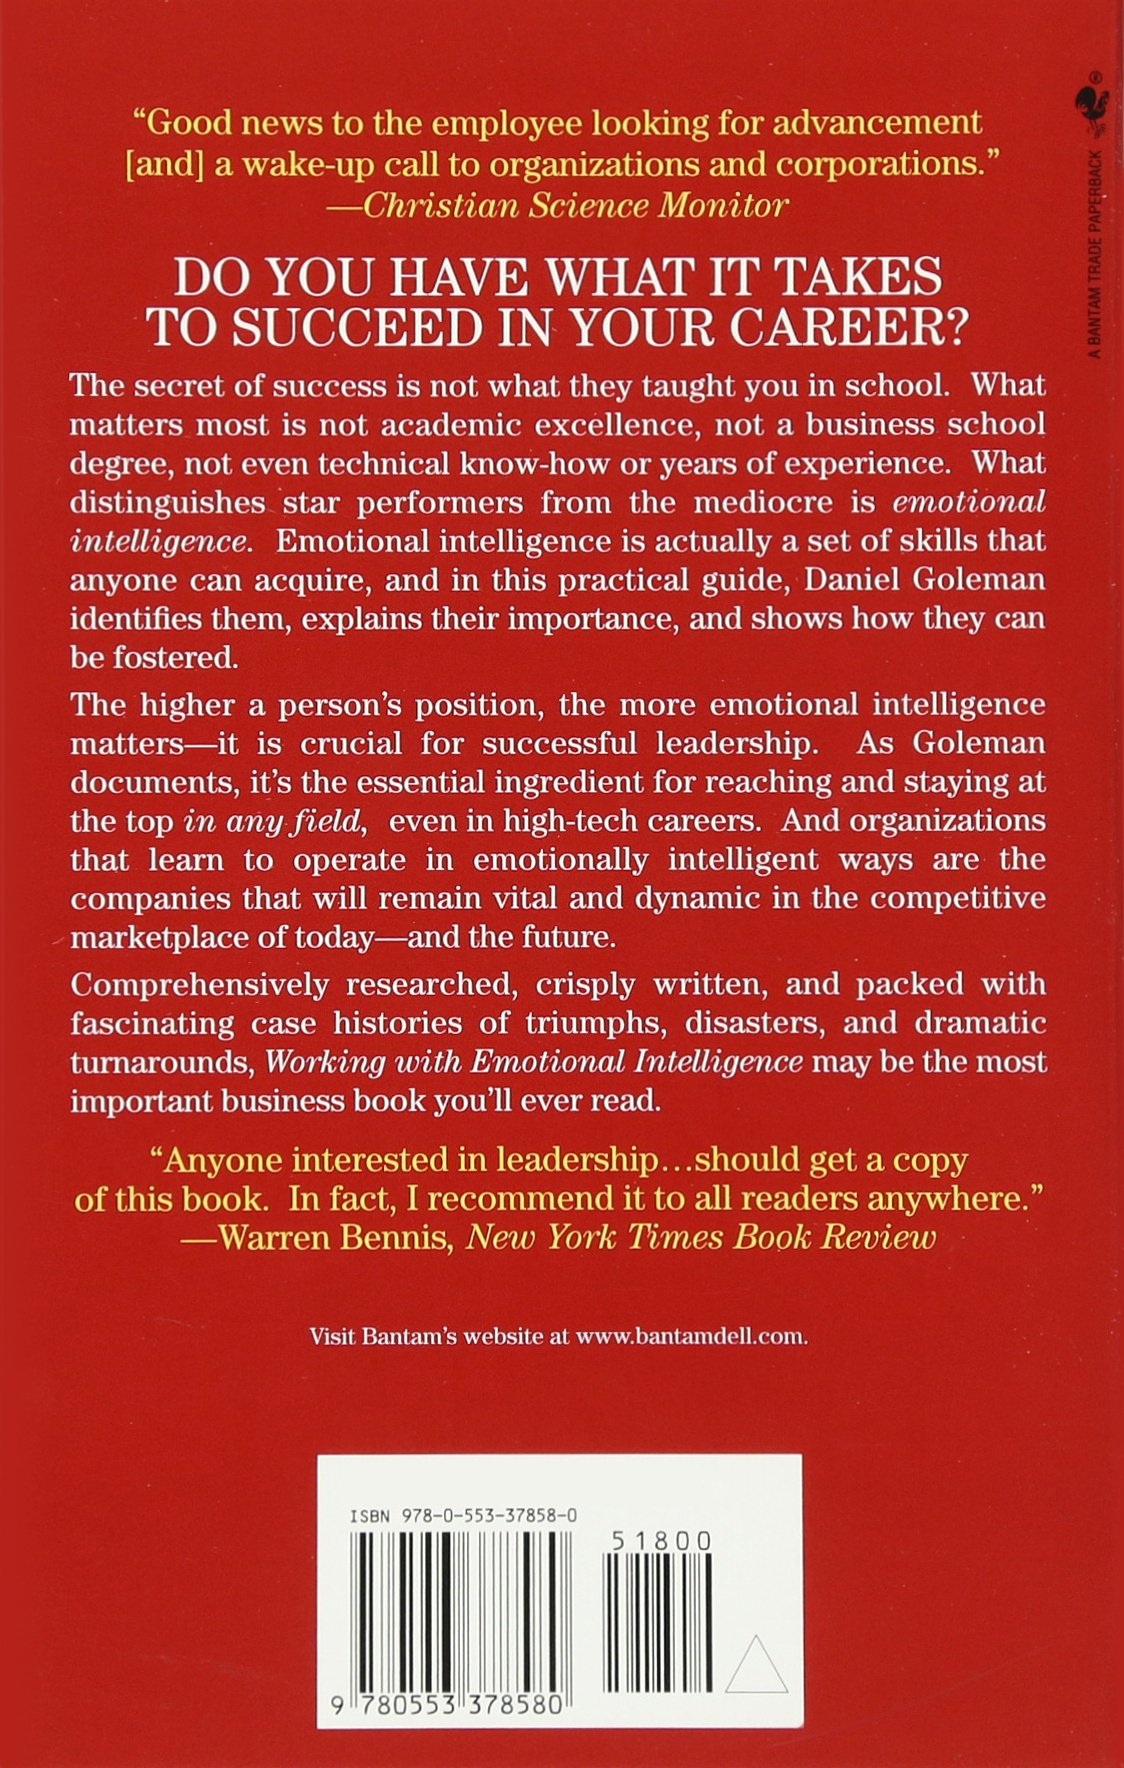 Working With Emotional Intelligence Daniel Goleman 9780553378580 Amazon Books